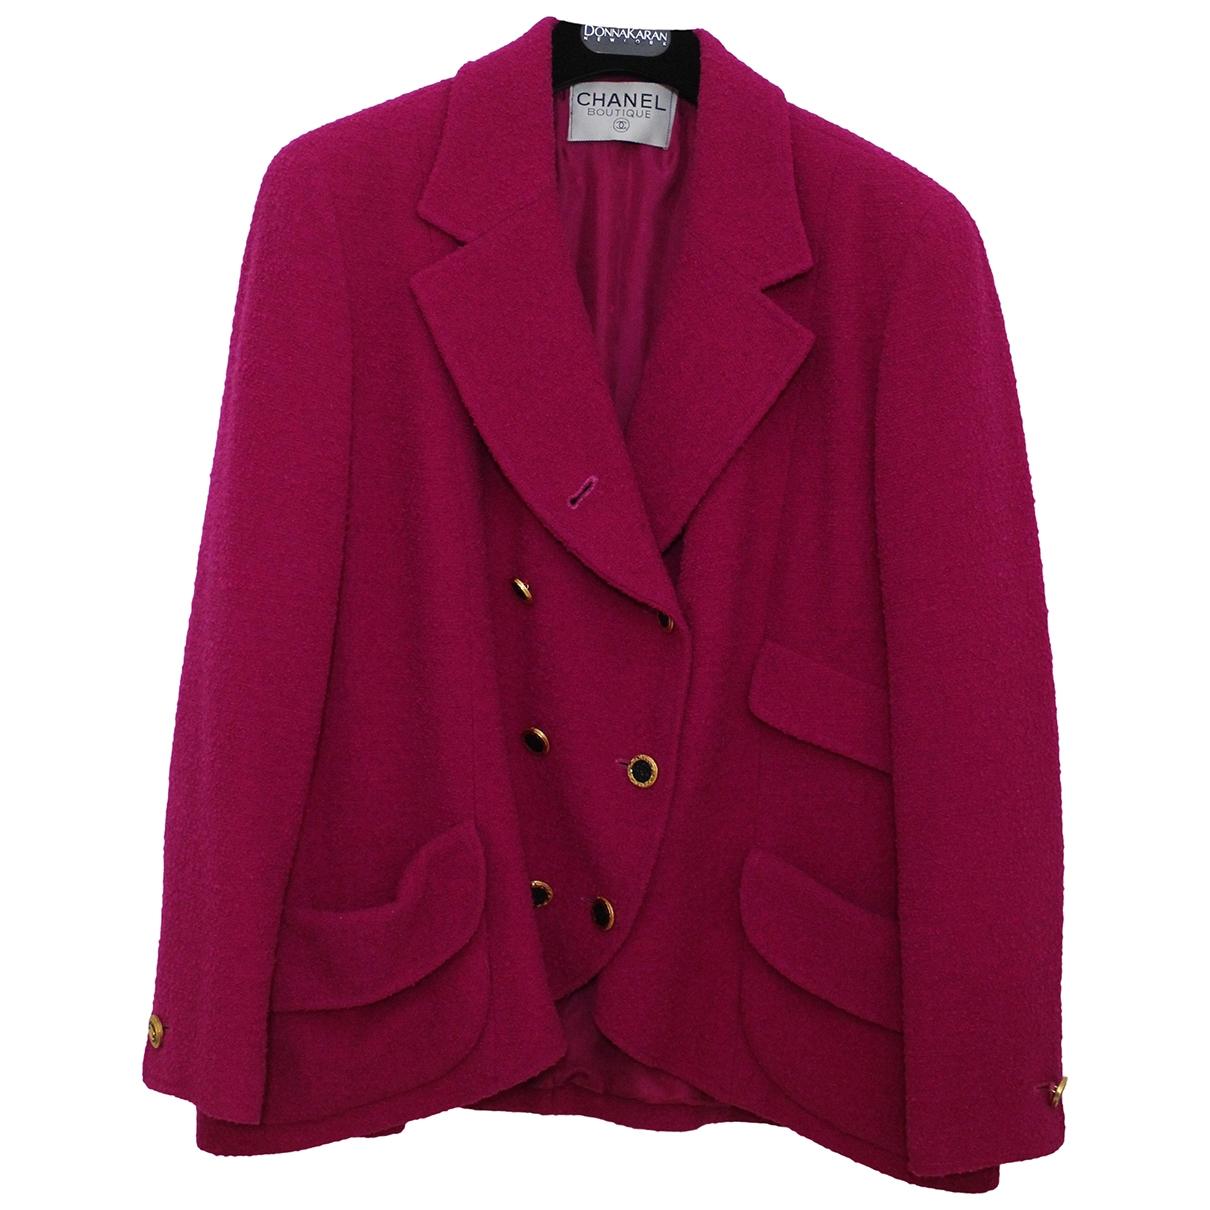 Chanel \N Pink Tweed jacket for Women 46 FR